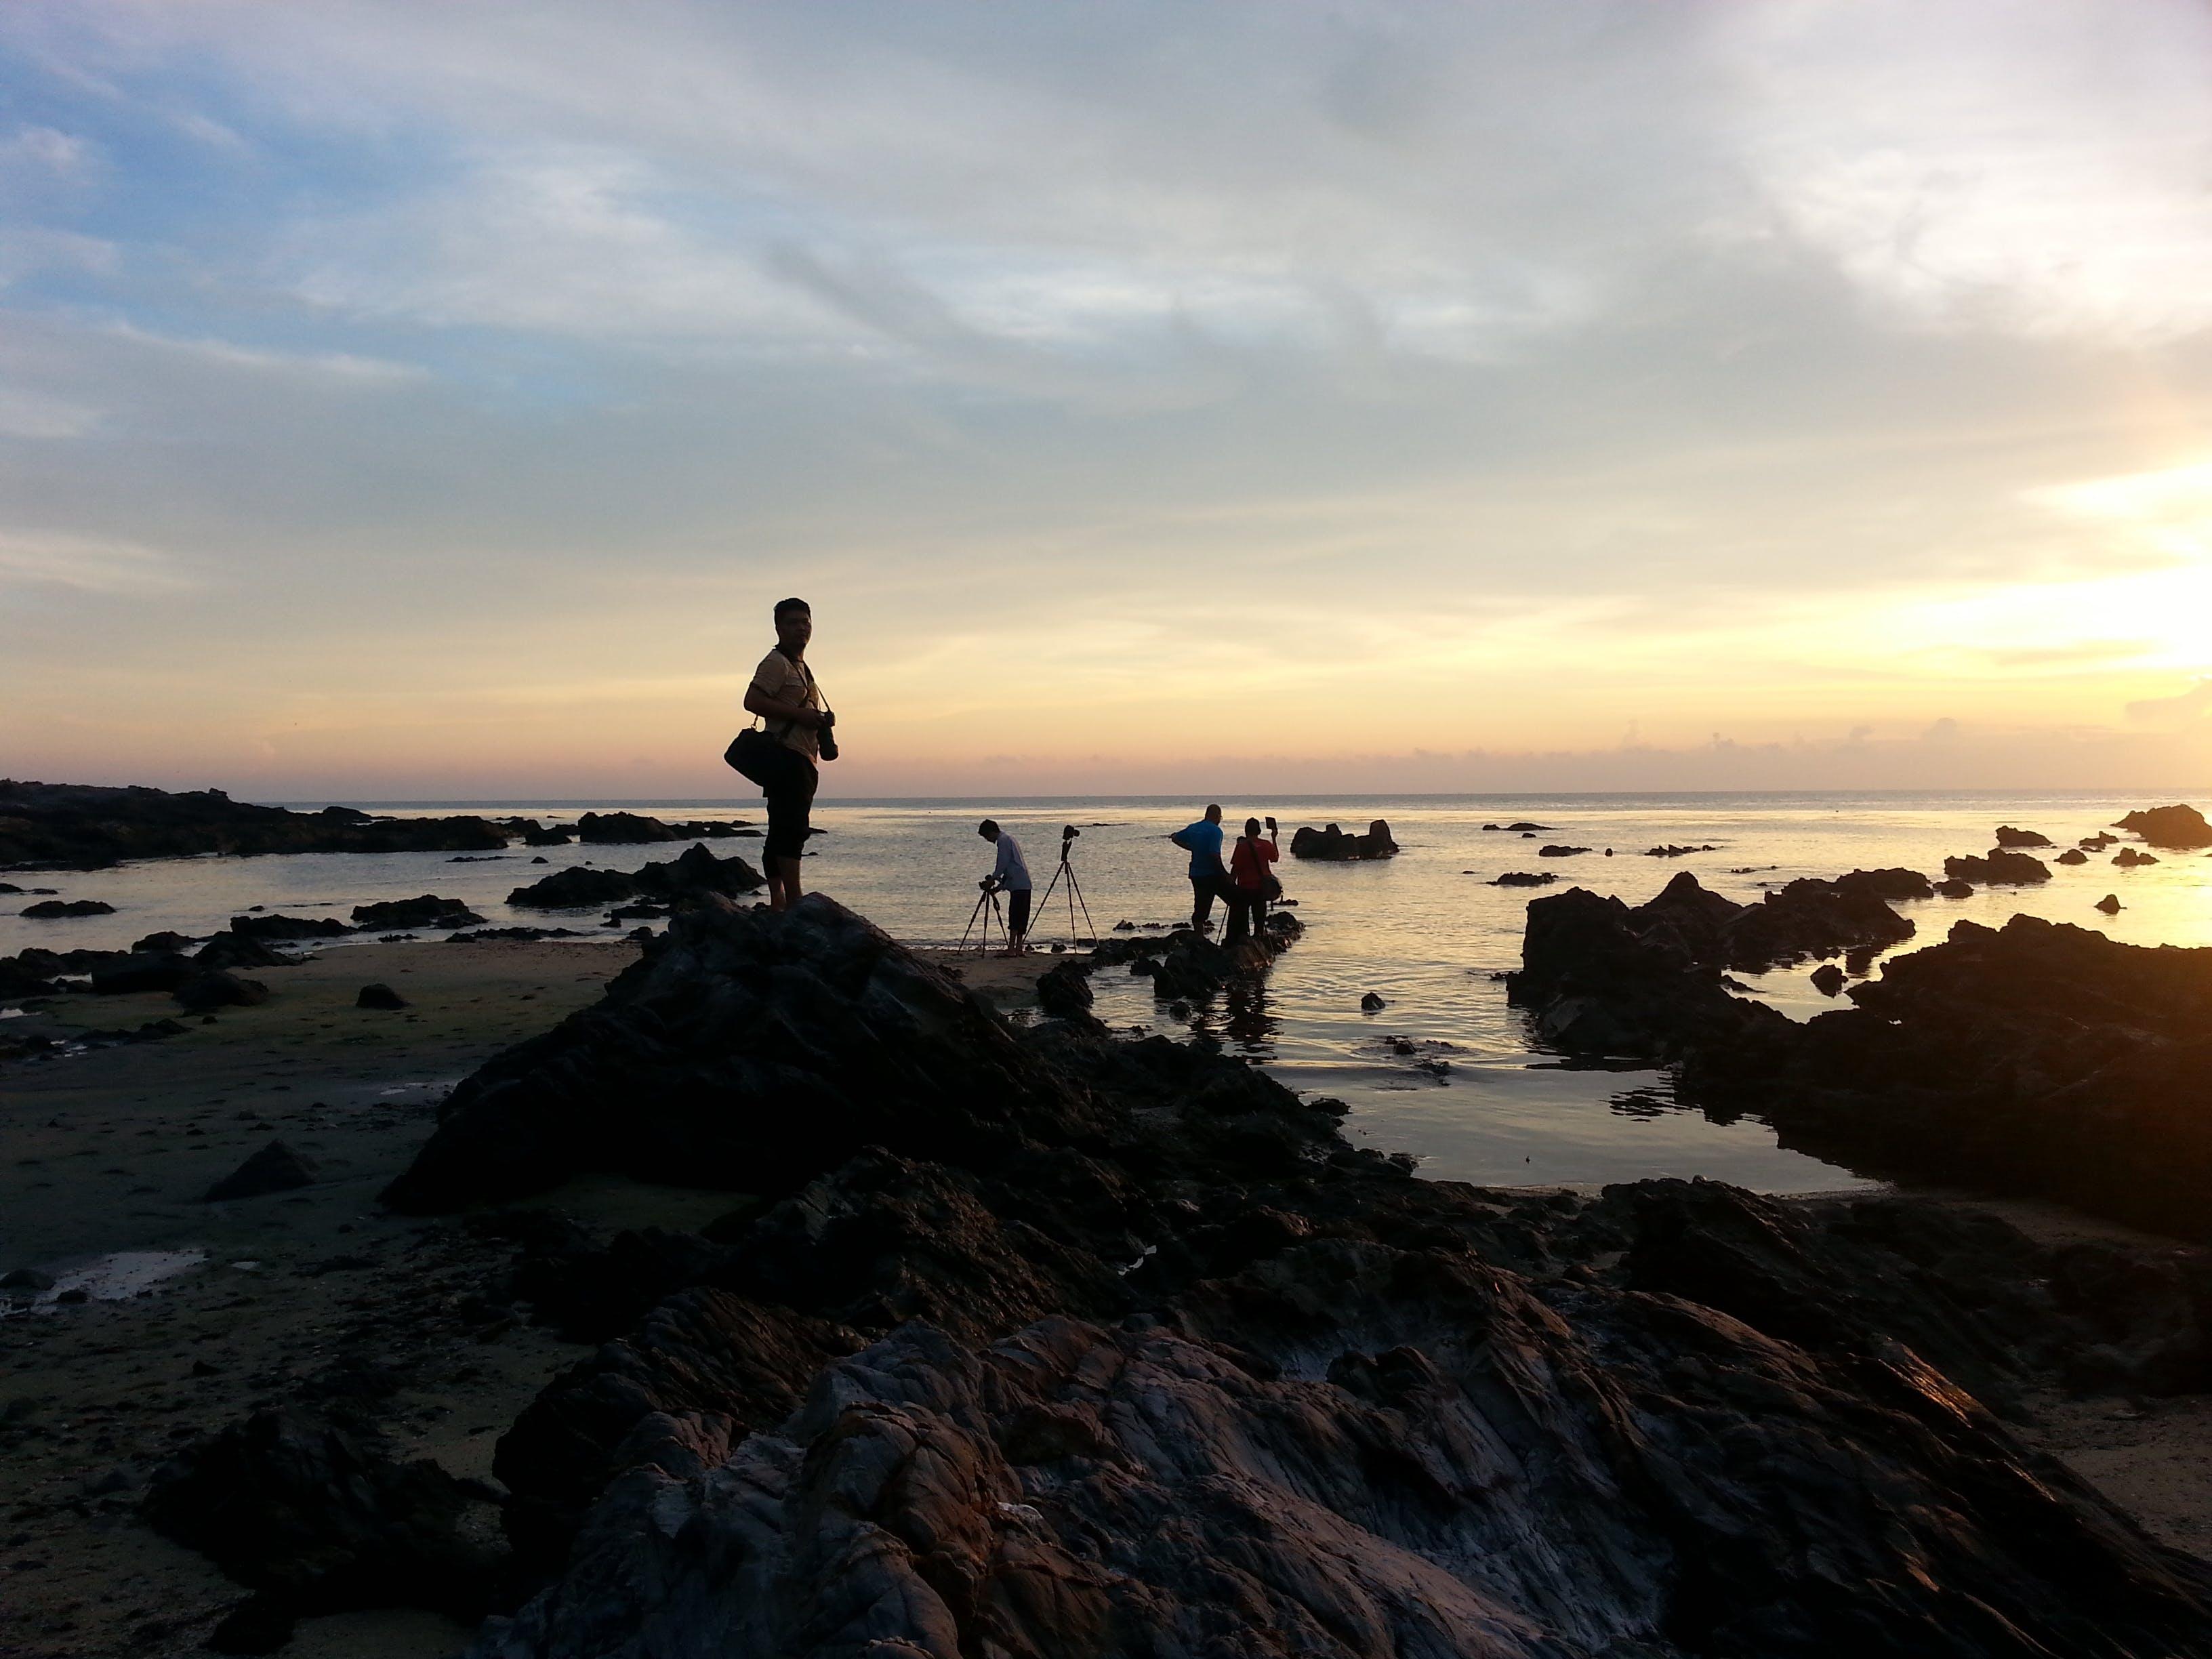 Silhouette of People on Seashore Under Gray Sky